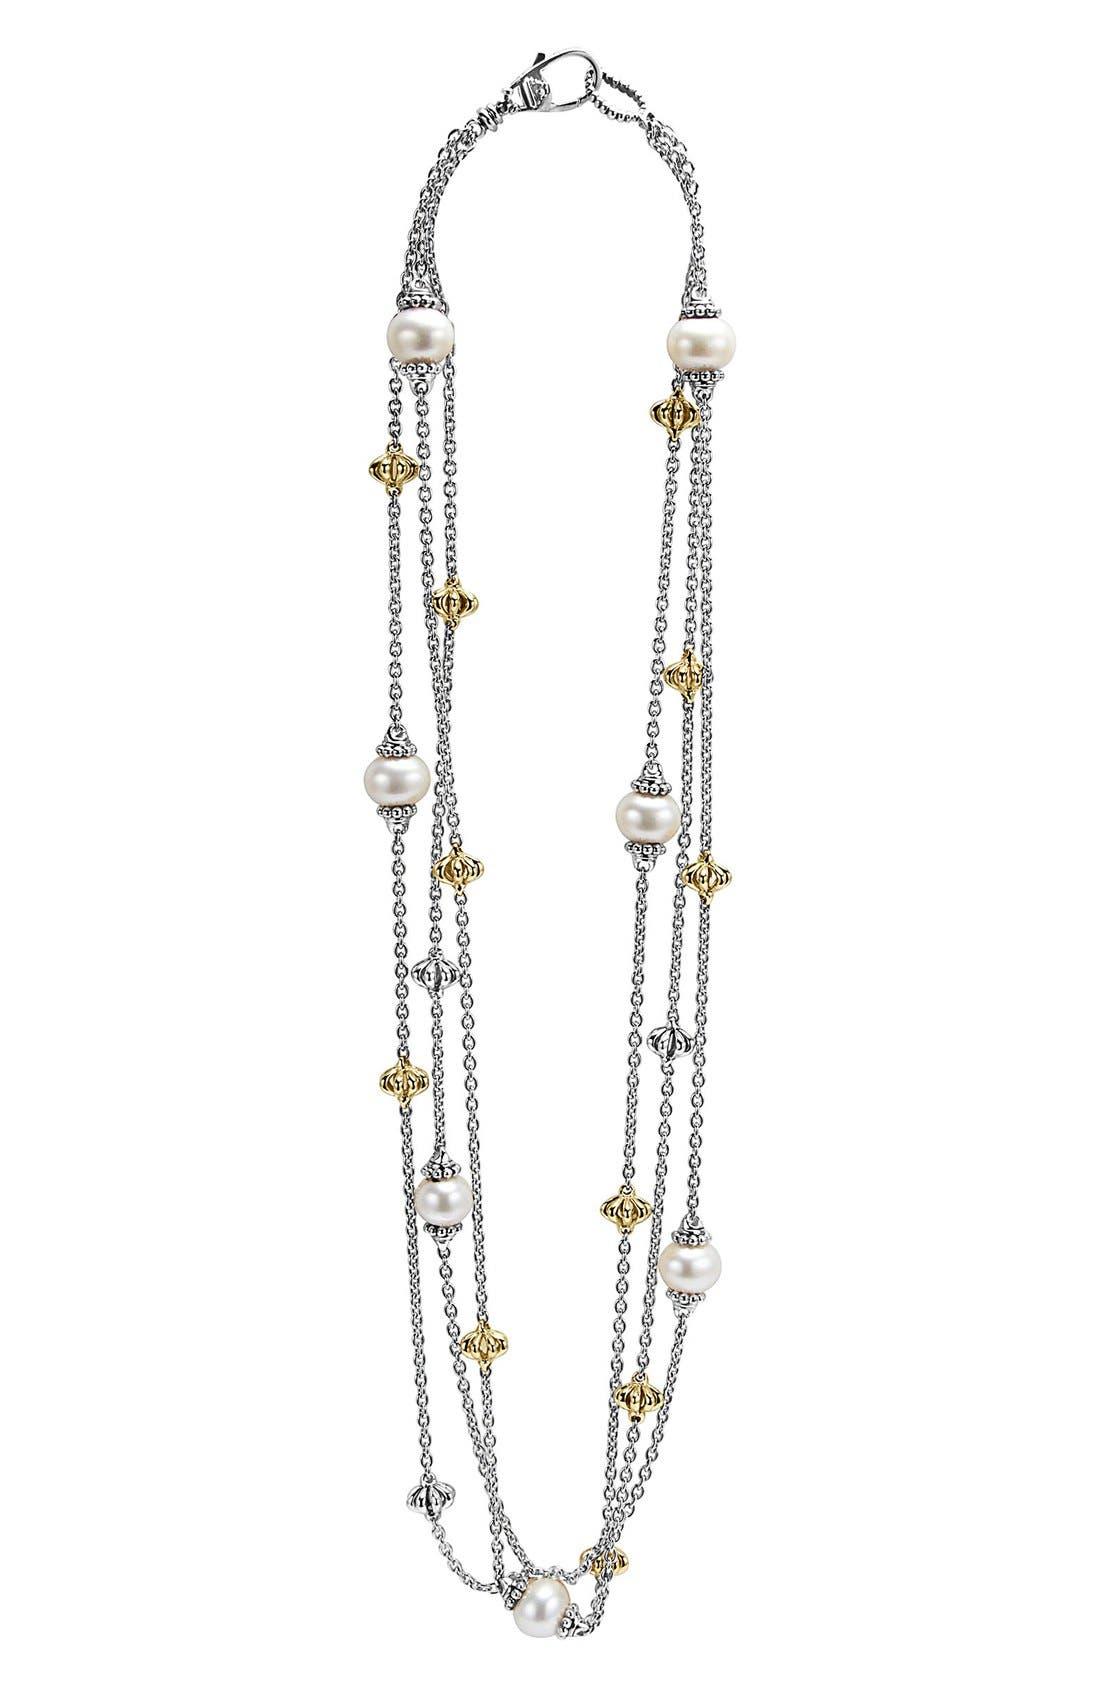 LAGOS 'Luna' Pearl Three-Strand Link Necklace